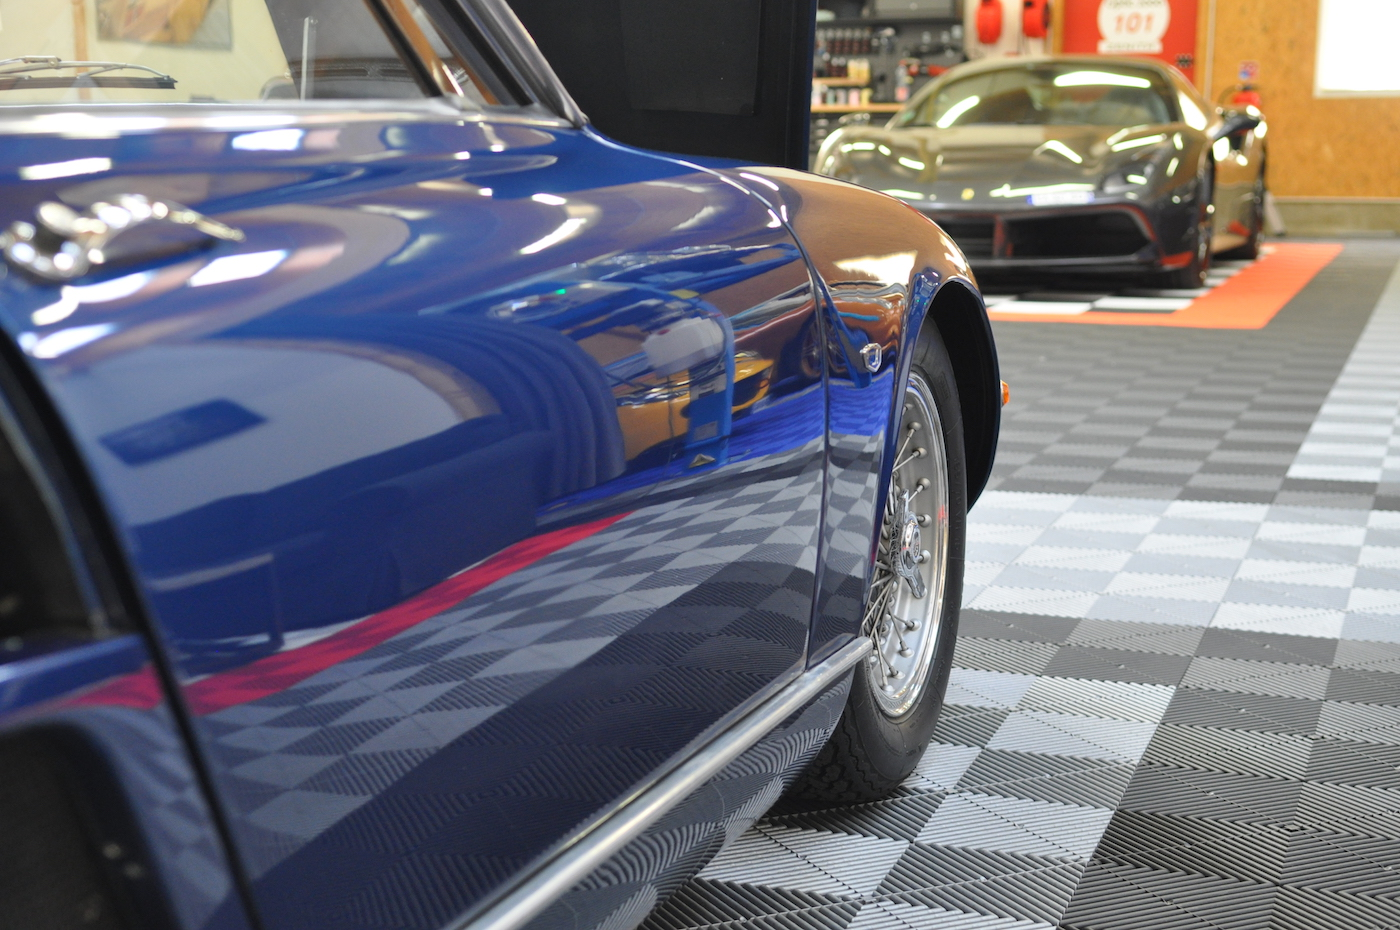 Swissvax Le Mans - ATS 3000 GTS